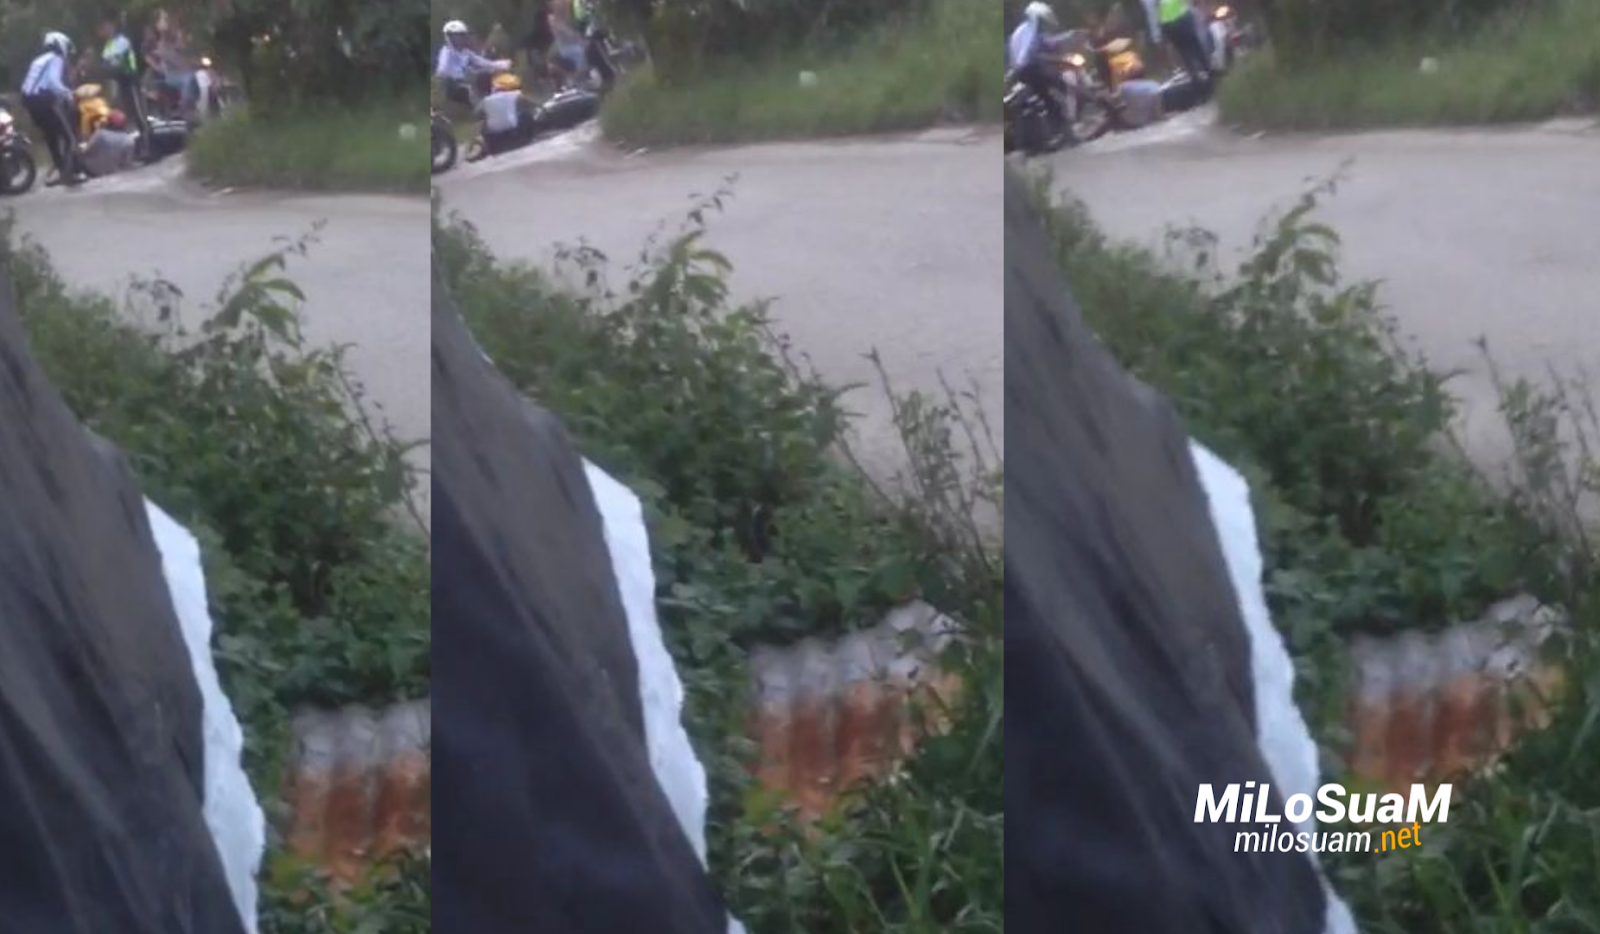 Polis traffik maki hamun dan sepak penunggang motorsikal